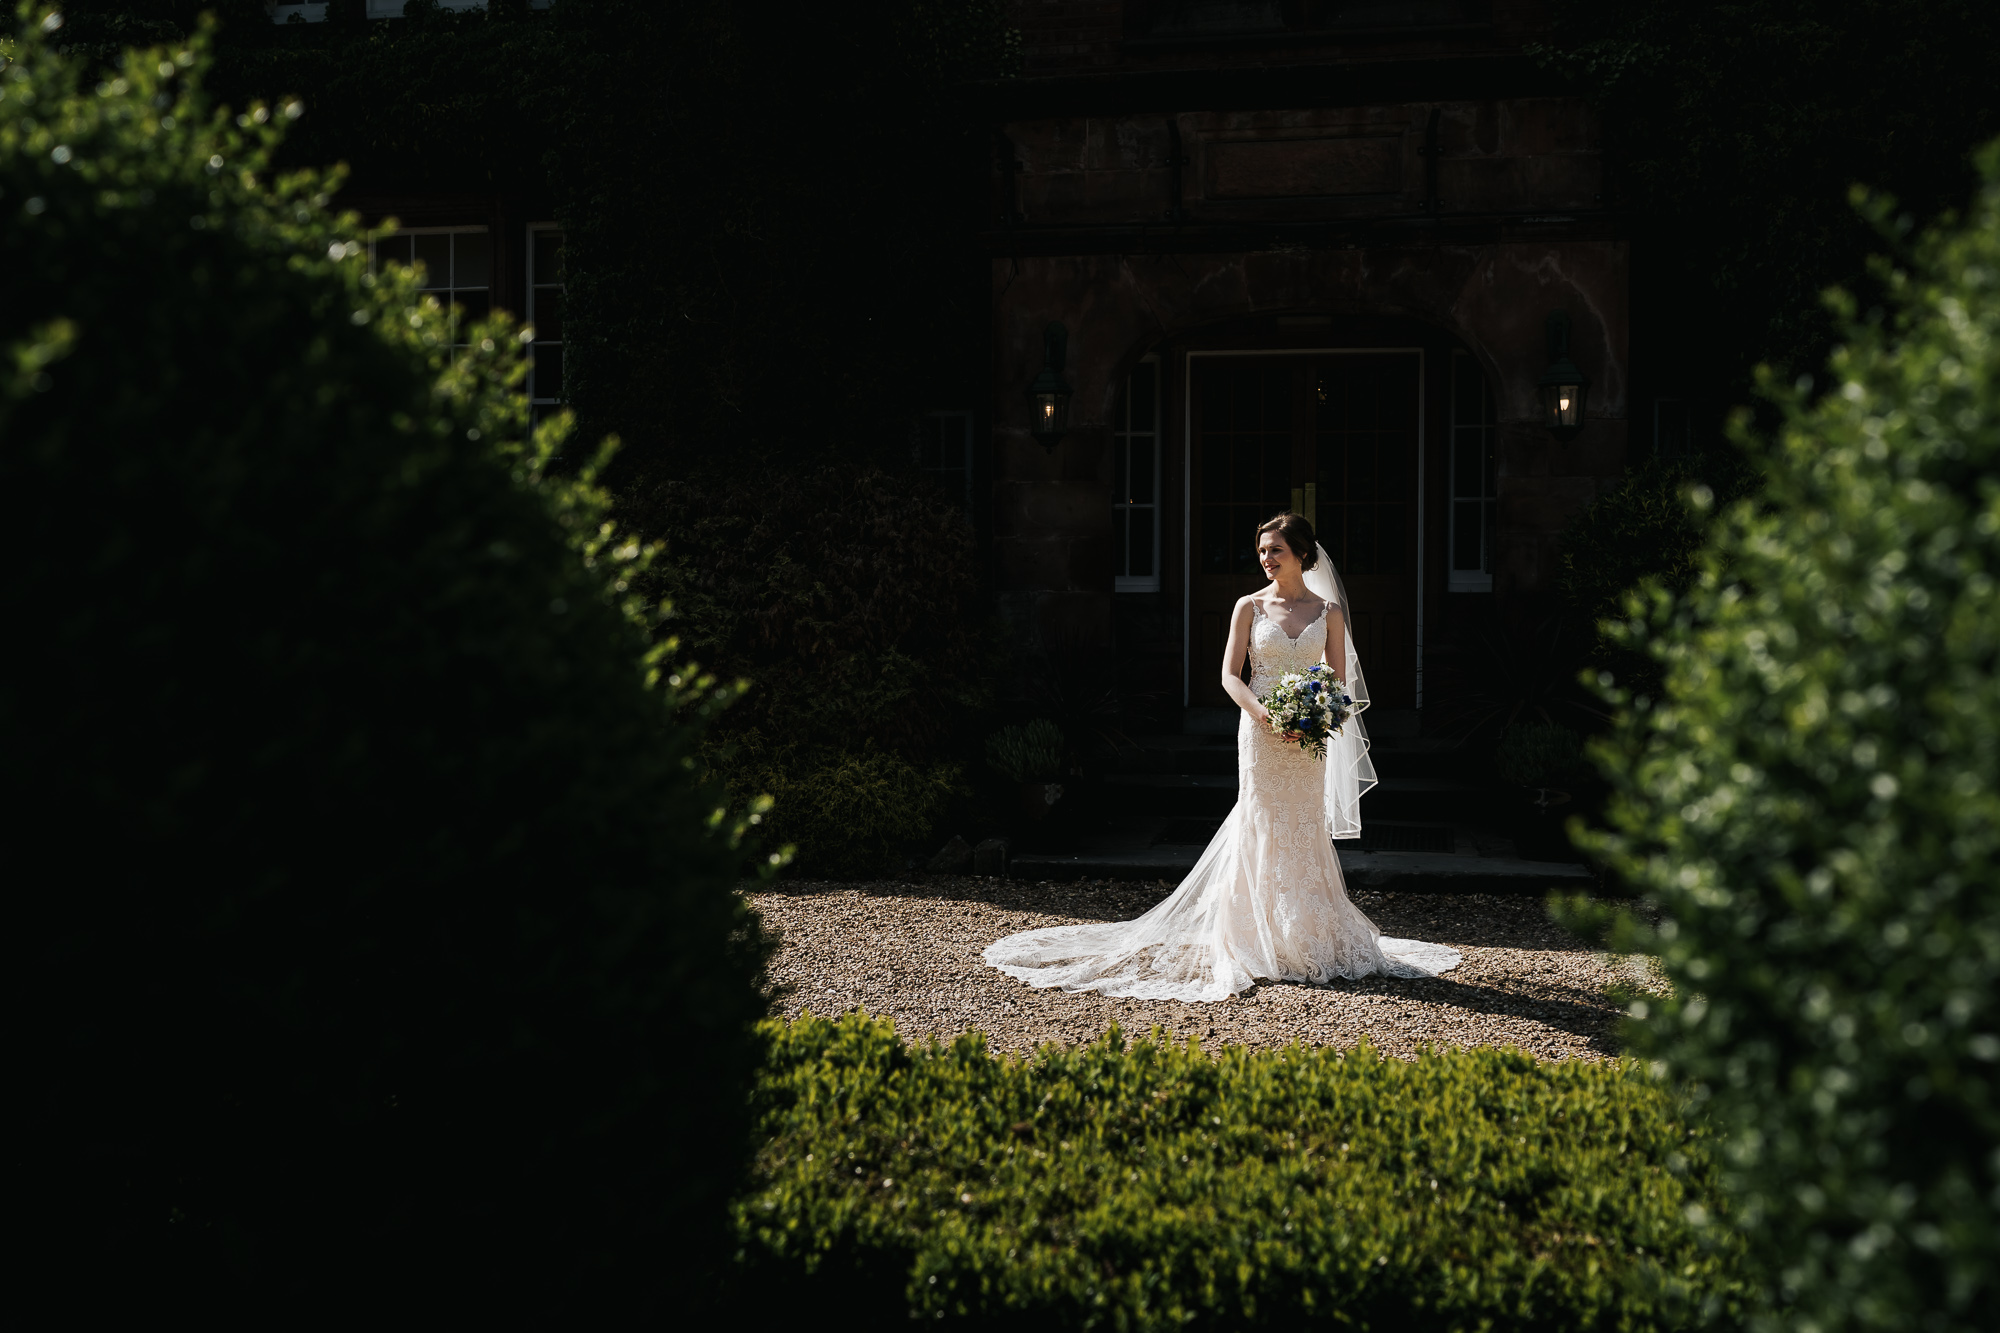 Nunsmere Hall Hotel Wedding photograhpy in cheshire wedding photographer (26 of 42).jpg